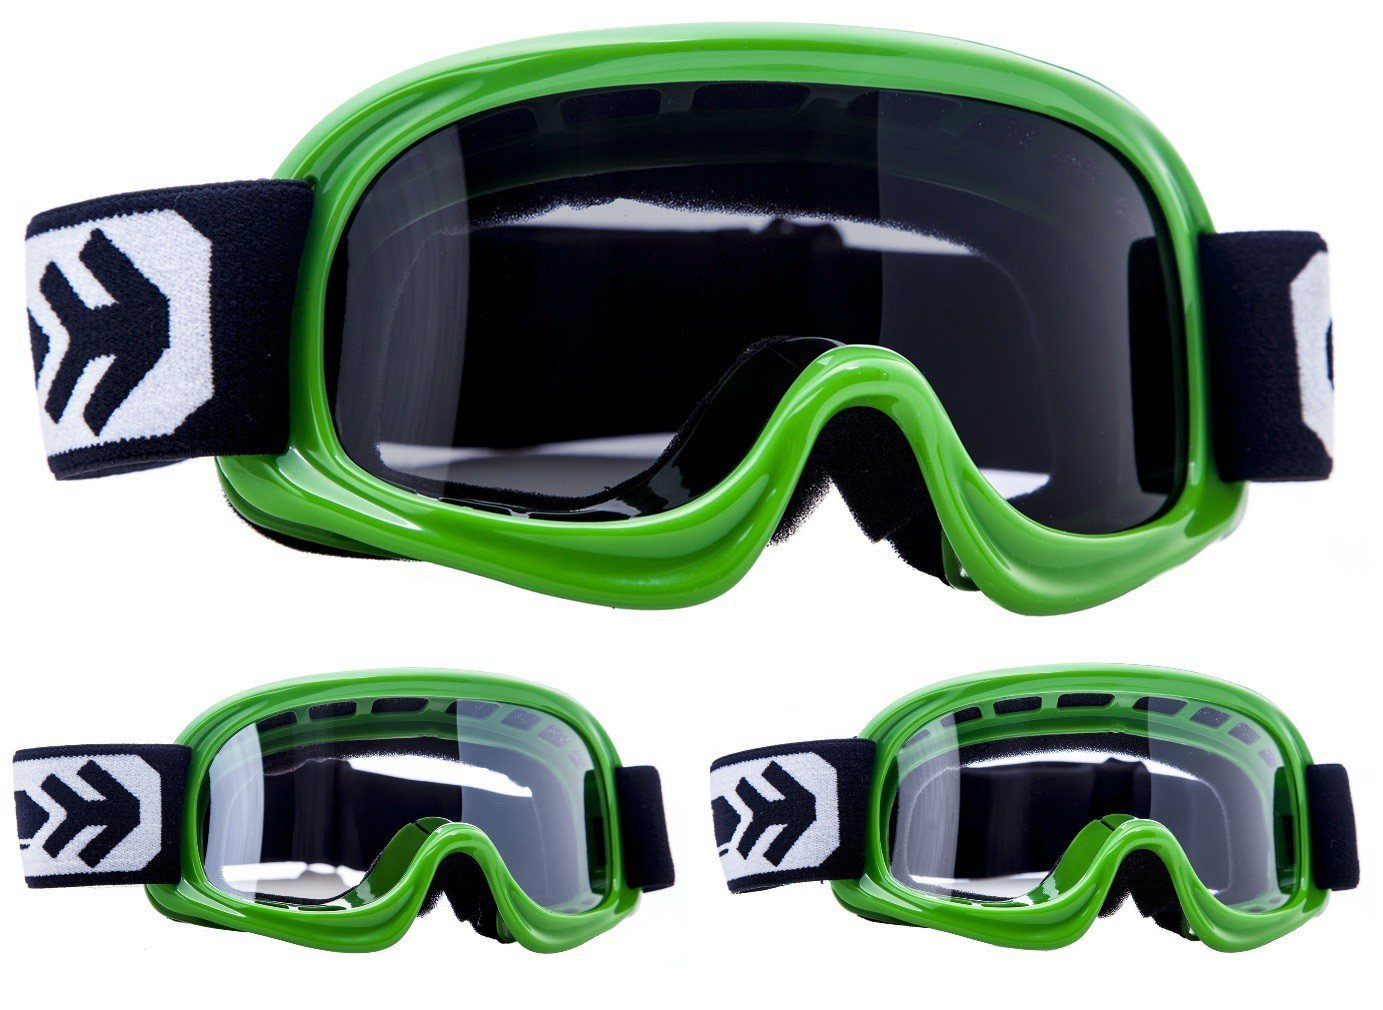 "white /· Cross Enfant /· Moto Windproof Ski MX Lunettes de Protection Masques de Moto Cross /· Black // Silver // Clear Armor /· AG-49 /""White/"""